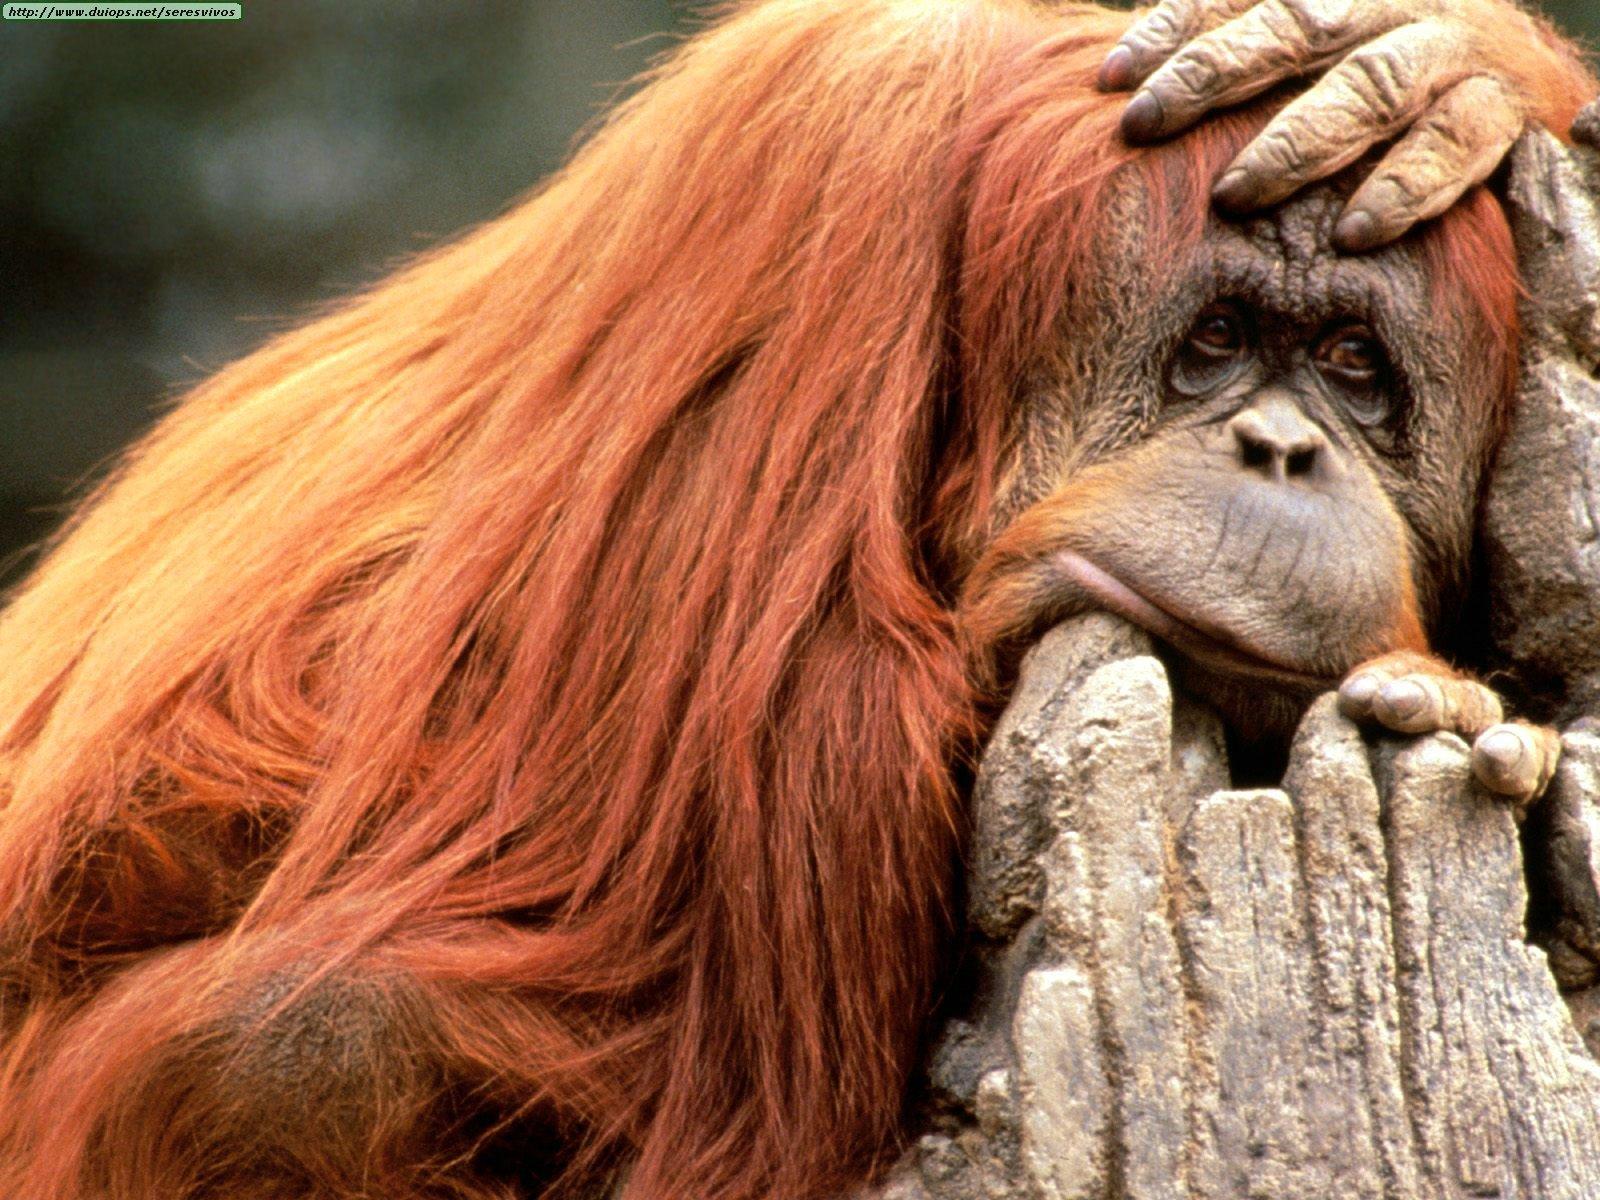 http://www.duiops.net/seresvivos/galeria/orangutanes/Animals%20Orangutans_Ready%20for%20the%20Weekend,%20Orangutan.jpg